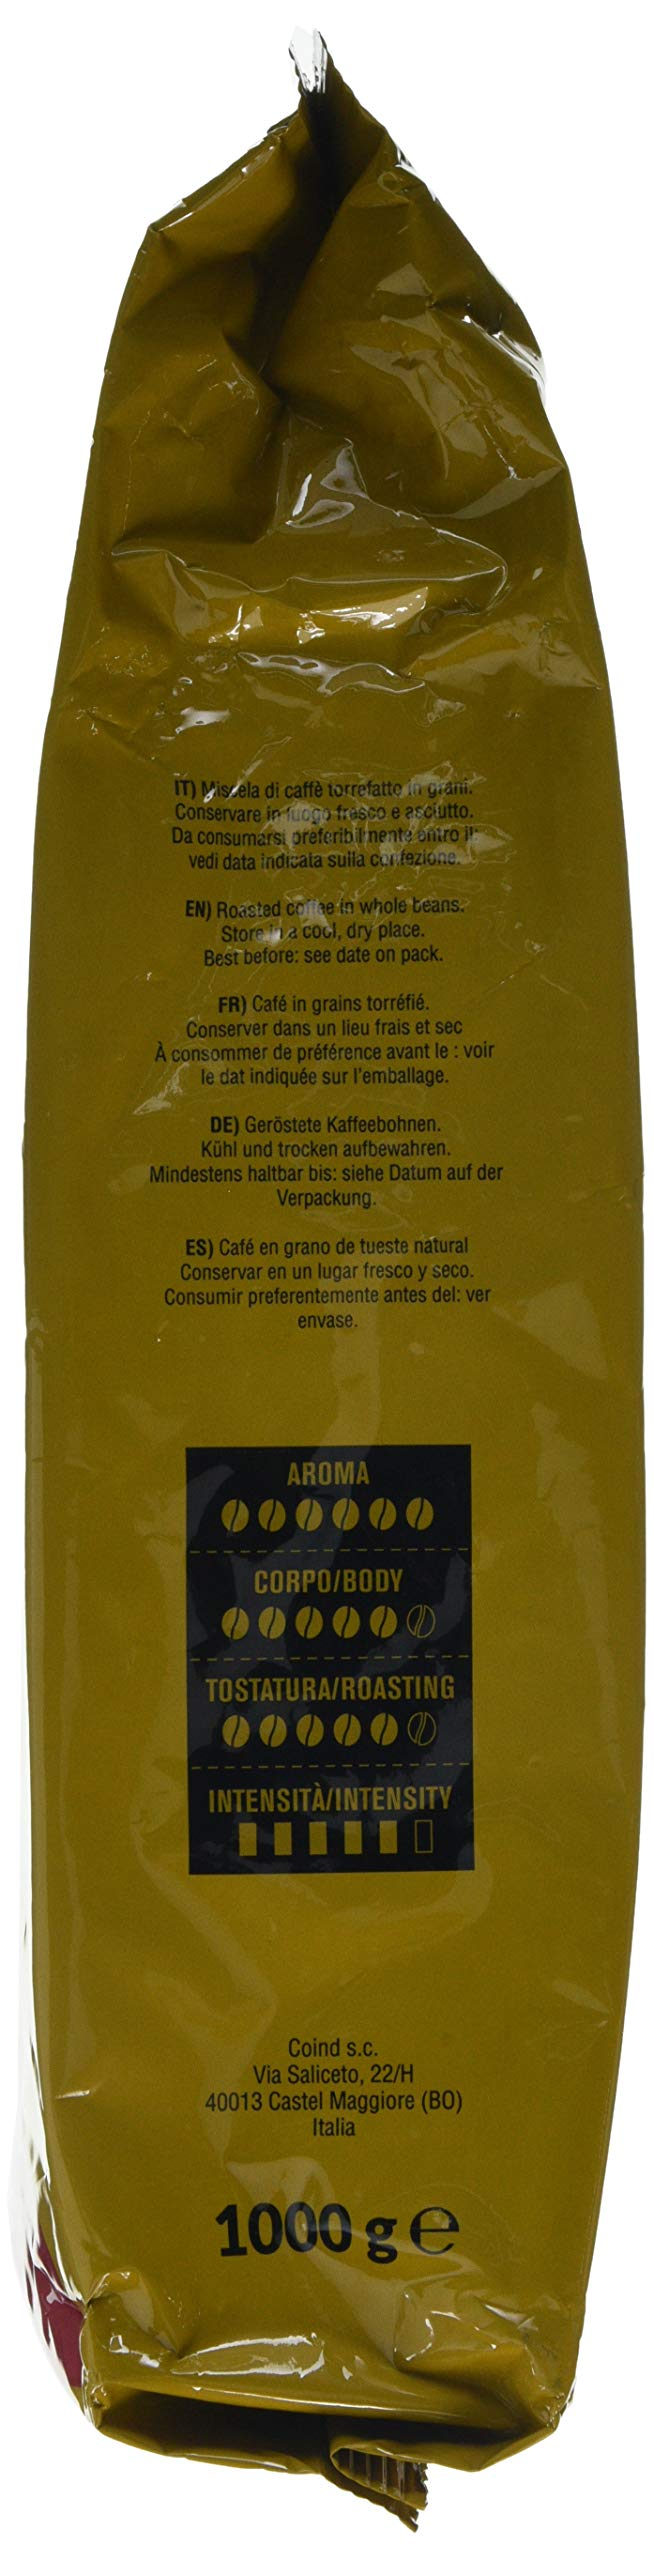 Consuelo Gran Aroma – Italian Coffee in whole beans – 1 kg